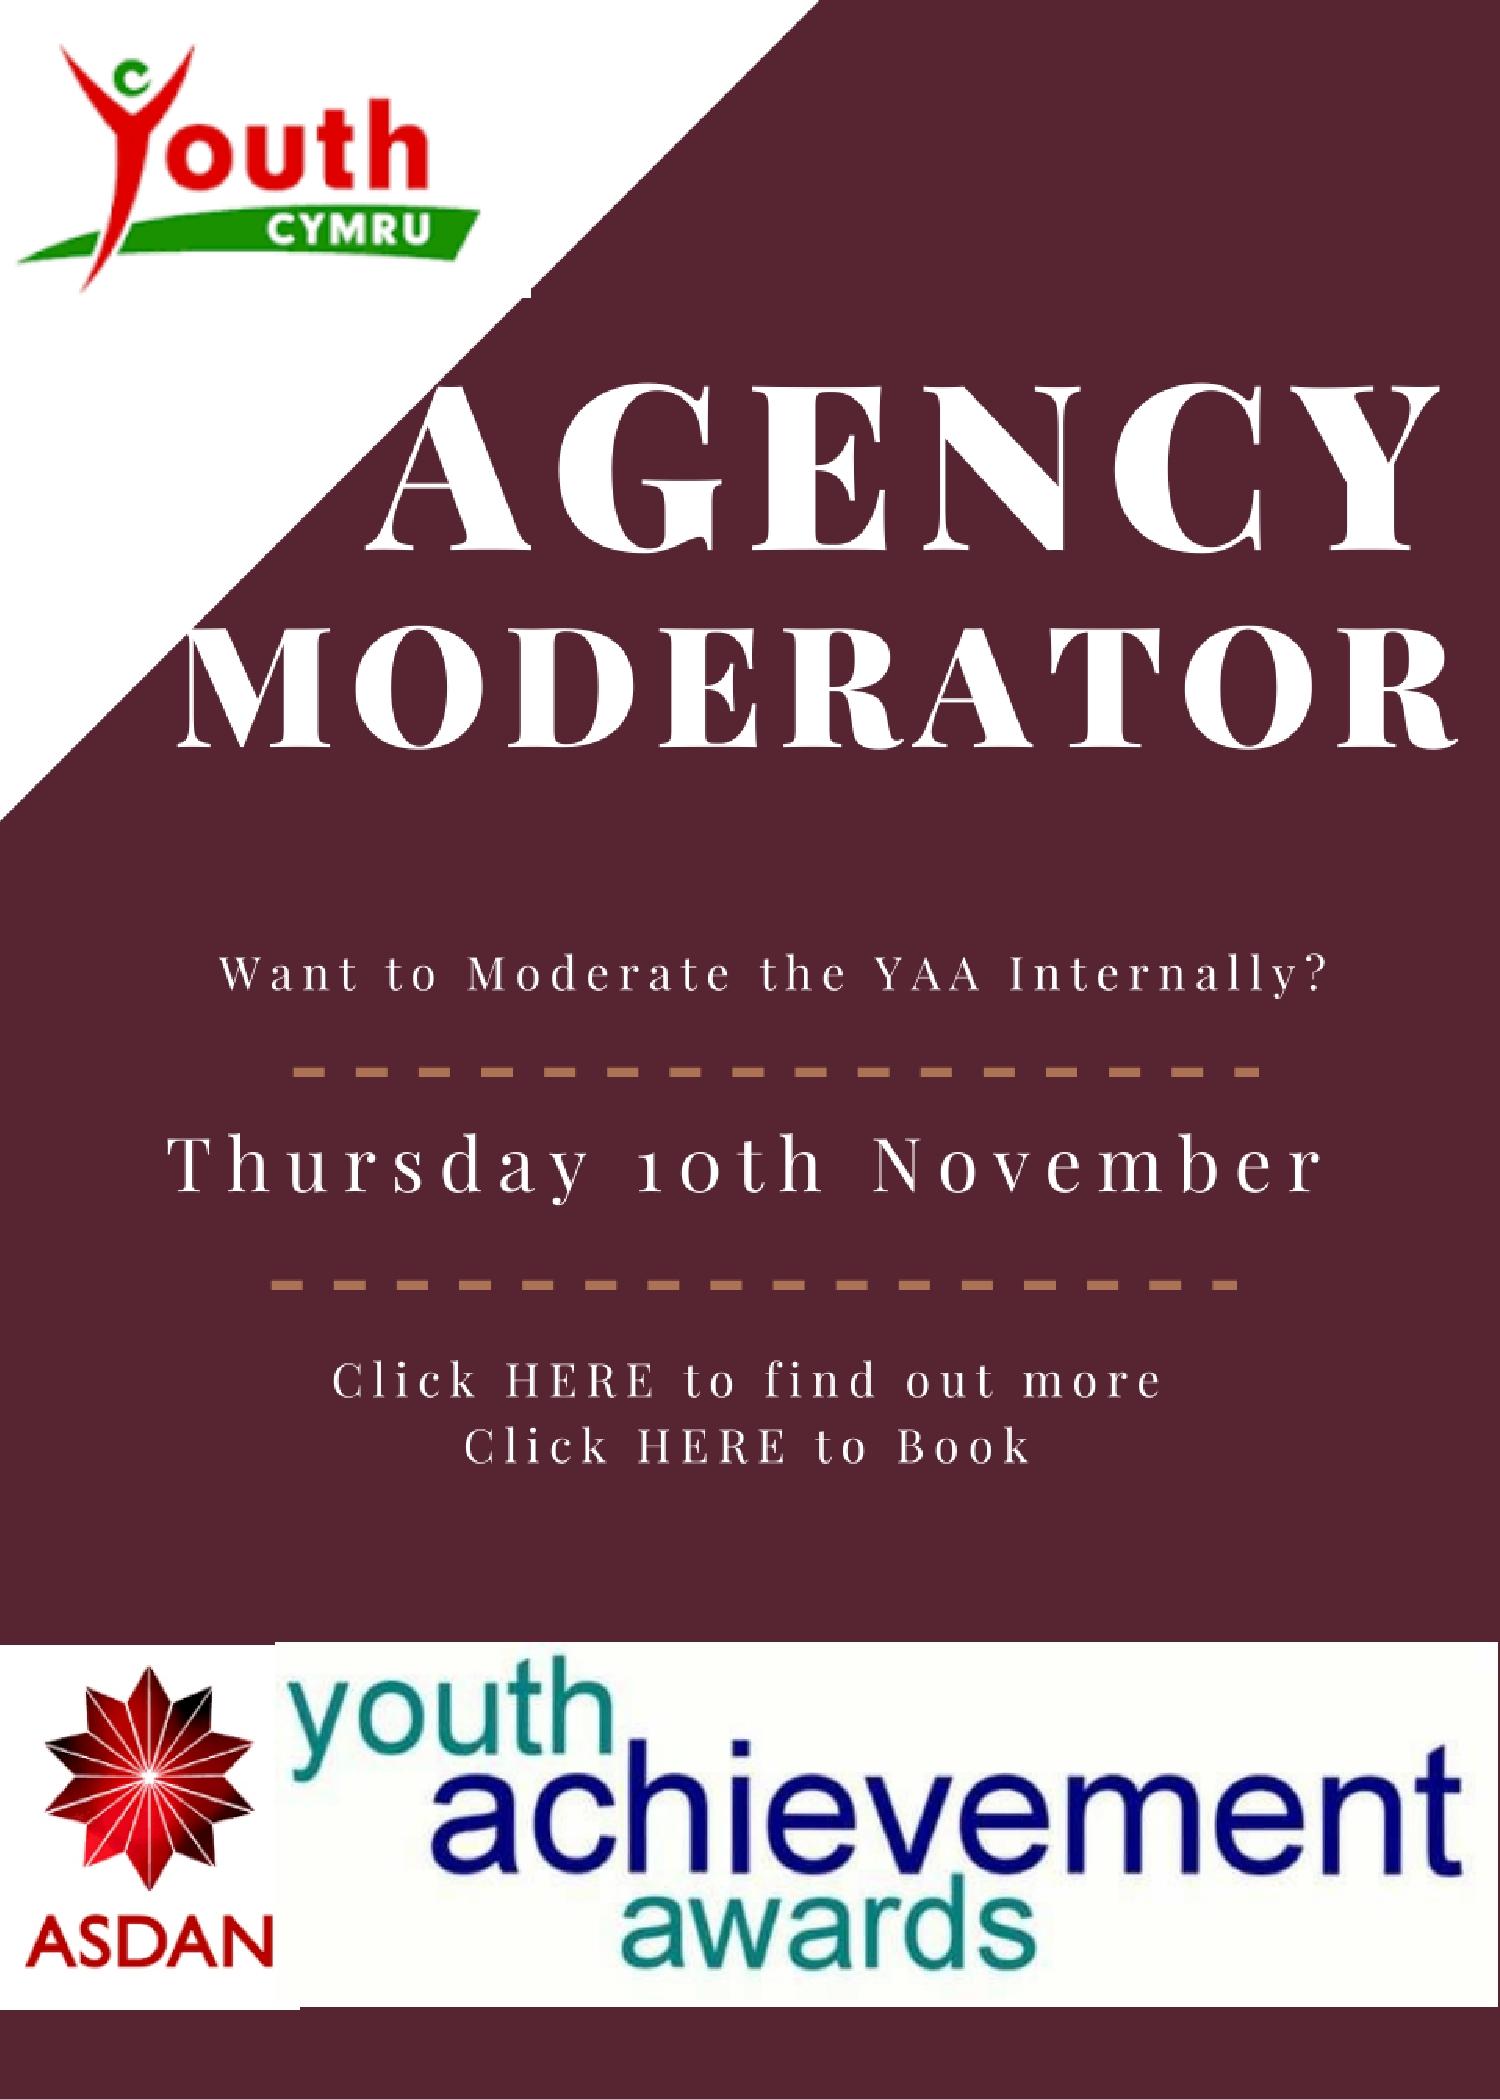 YAA Agency Moderator Course